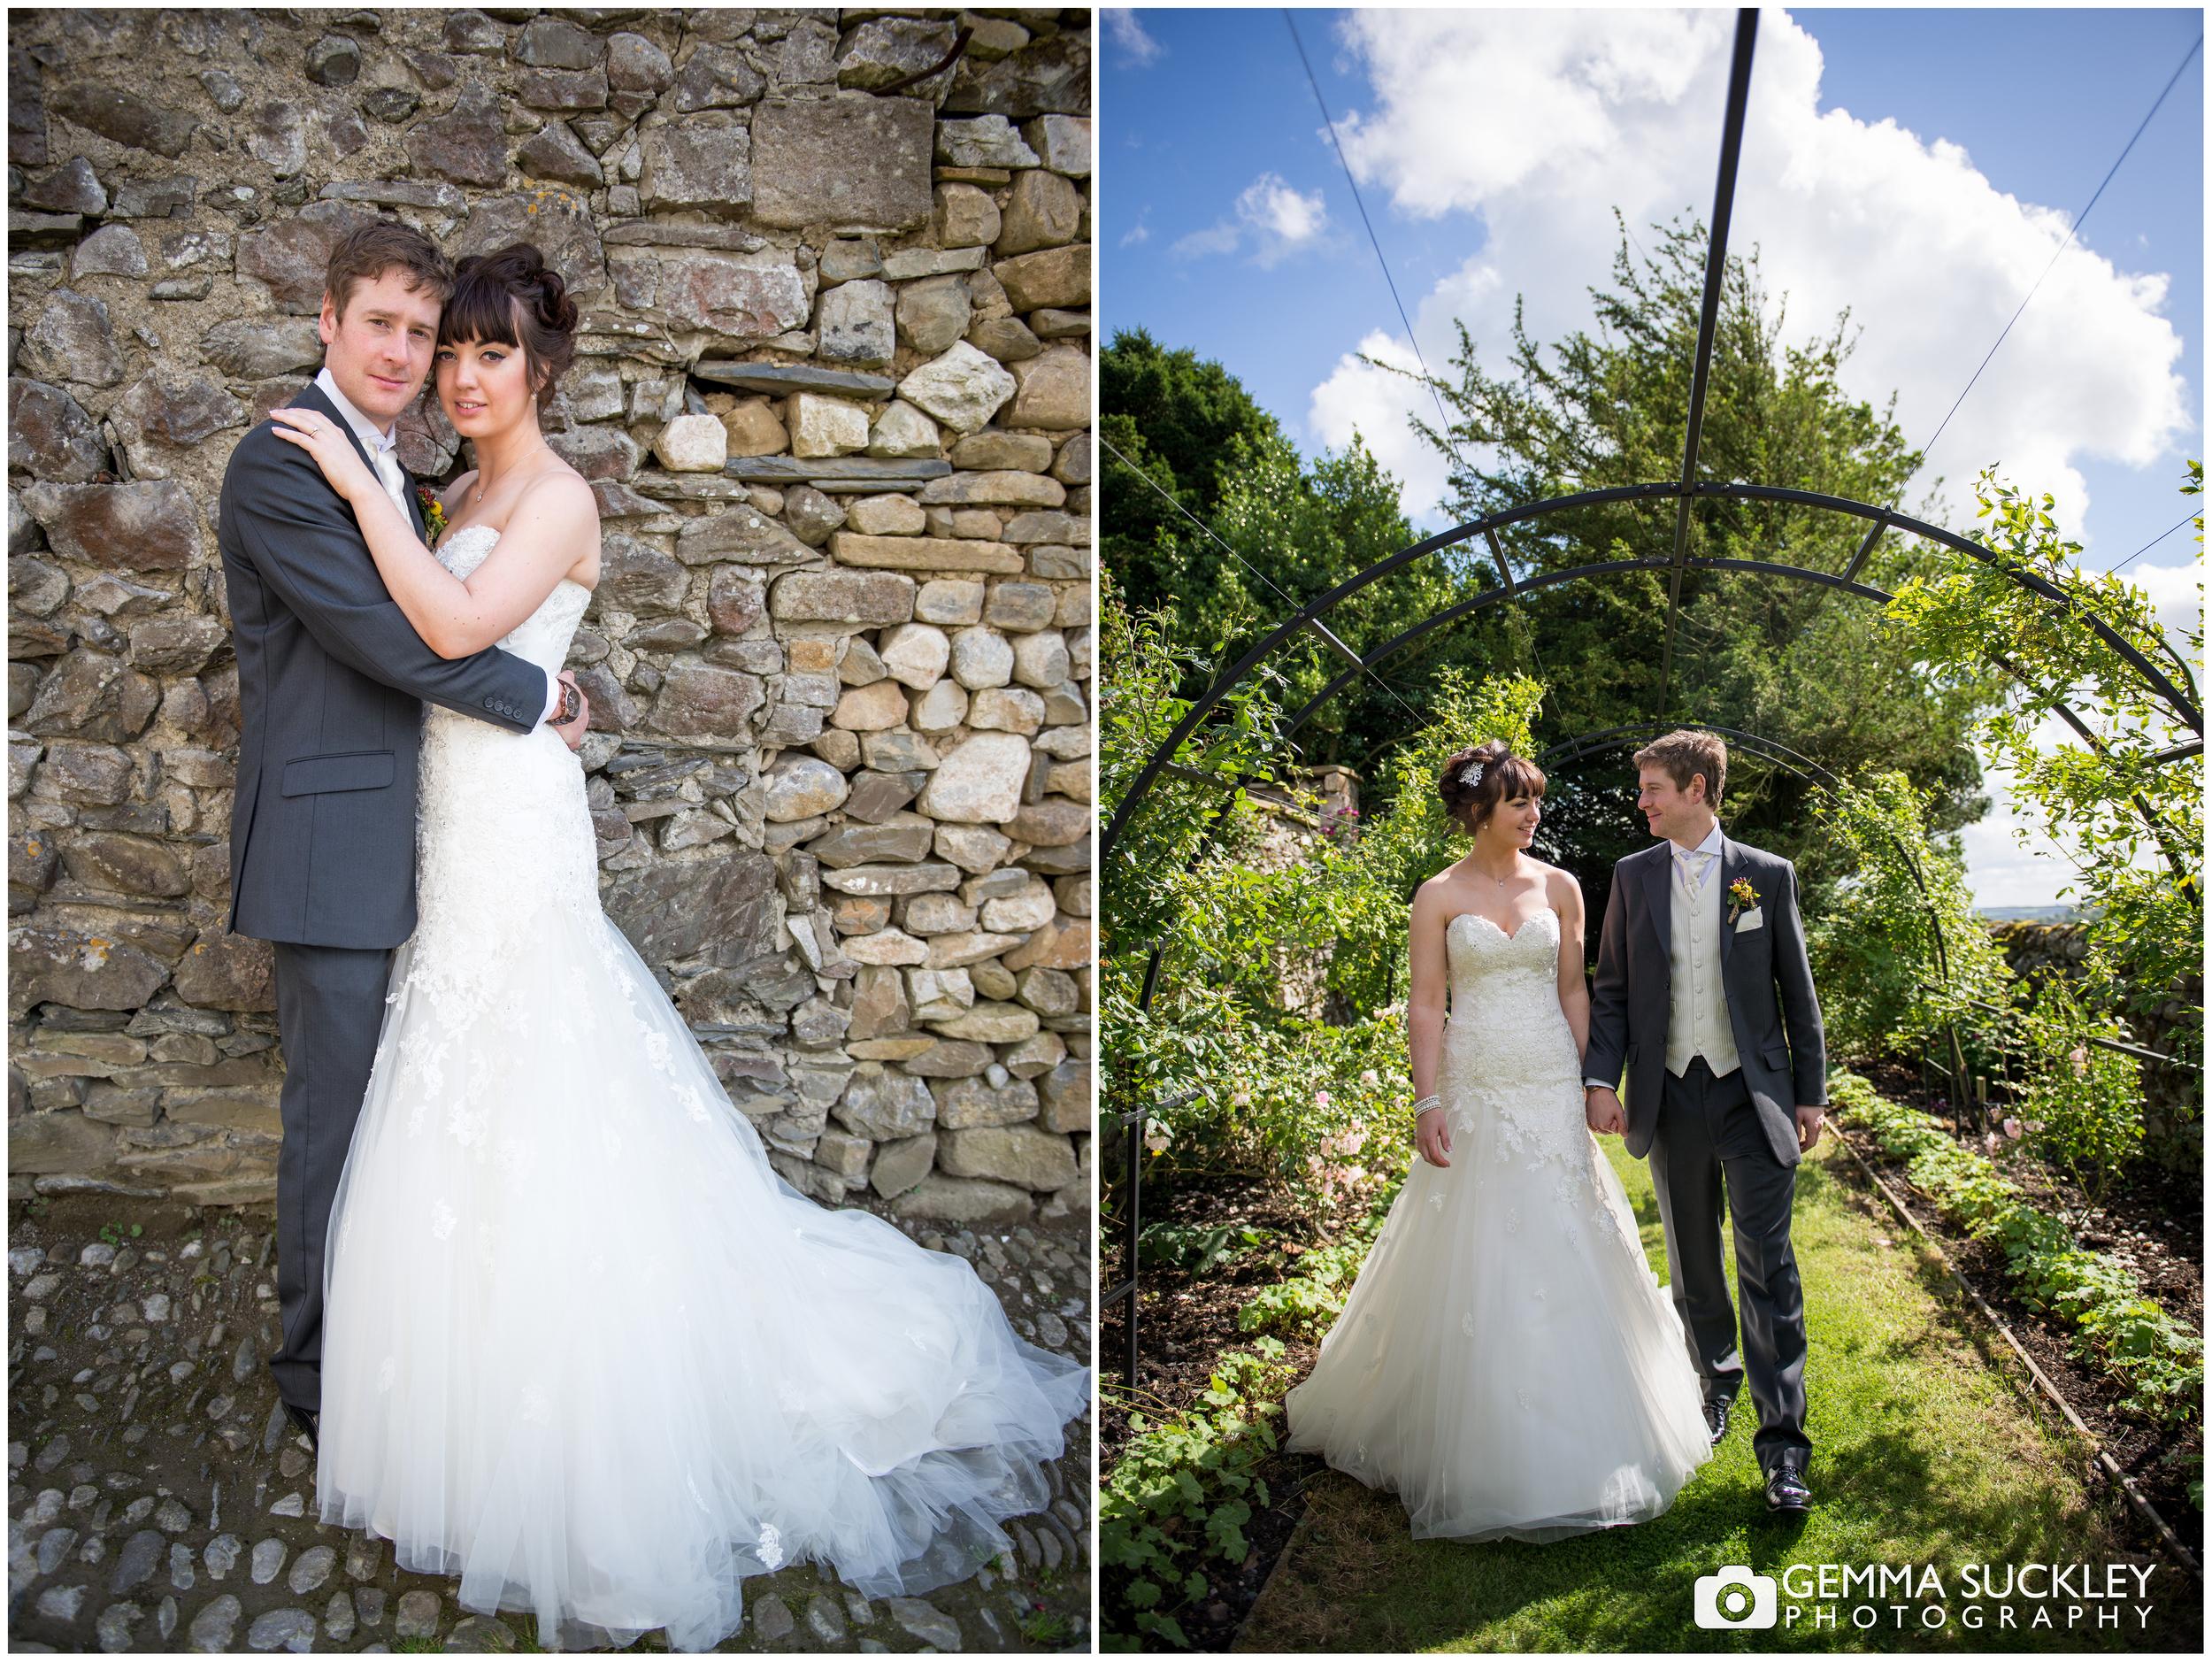 taitlands-gemma-suckley-wedding-photography.jpg